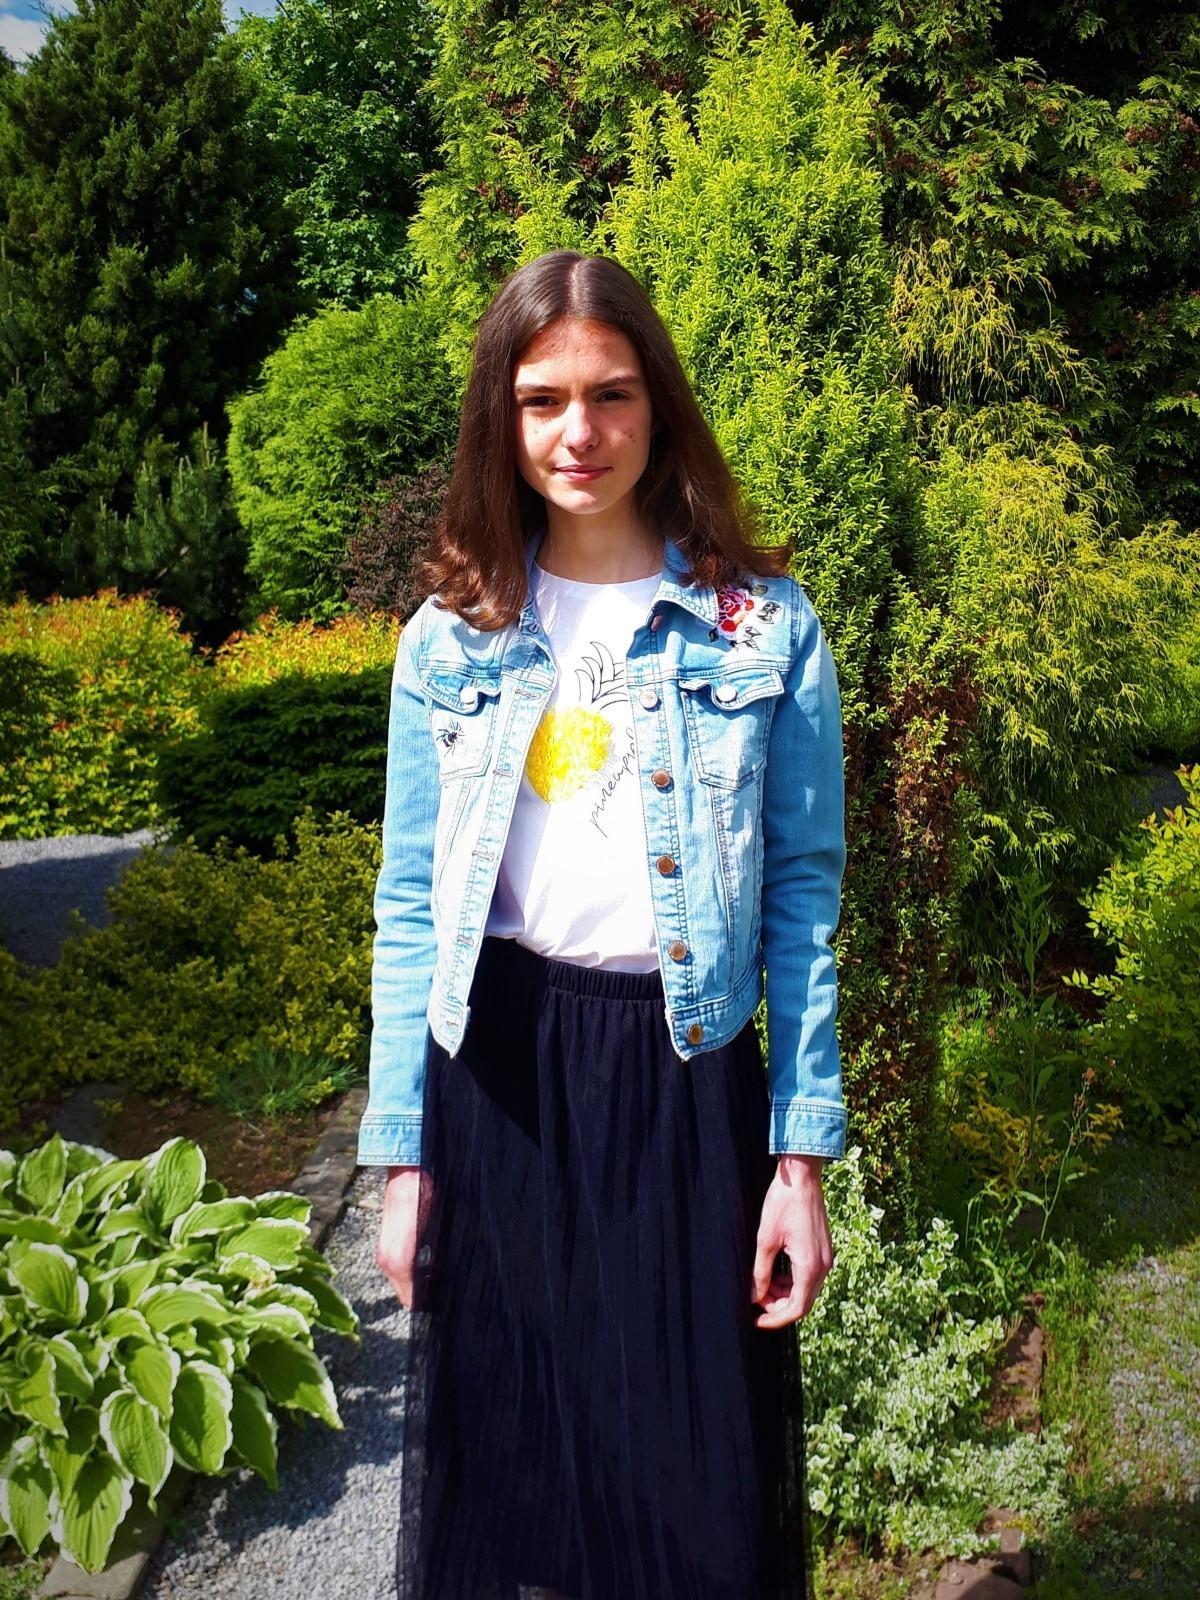 Nasi najlepsi – Magdalena Kutrzuba